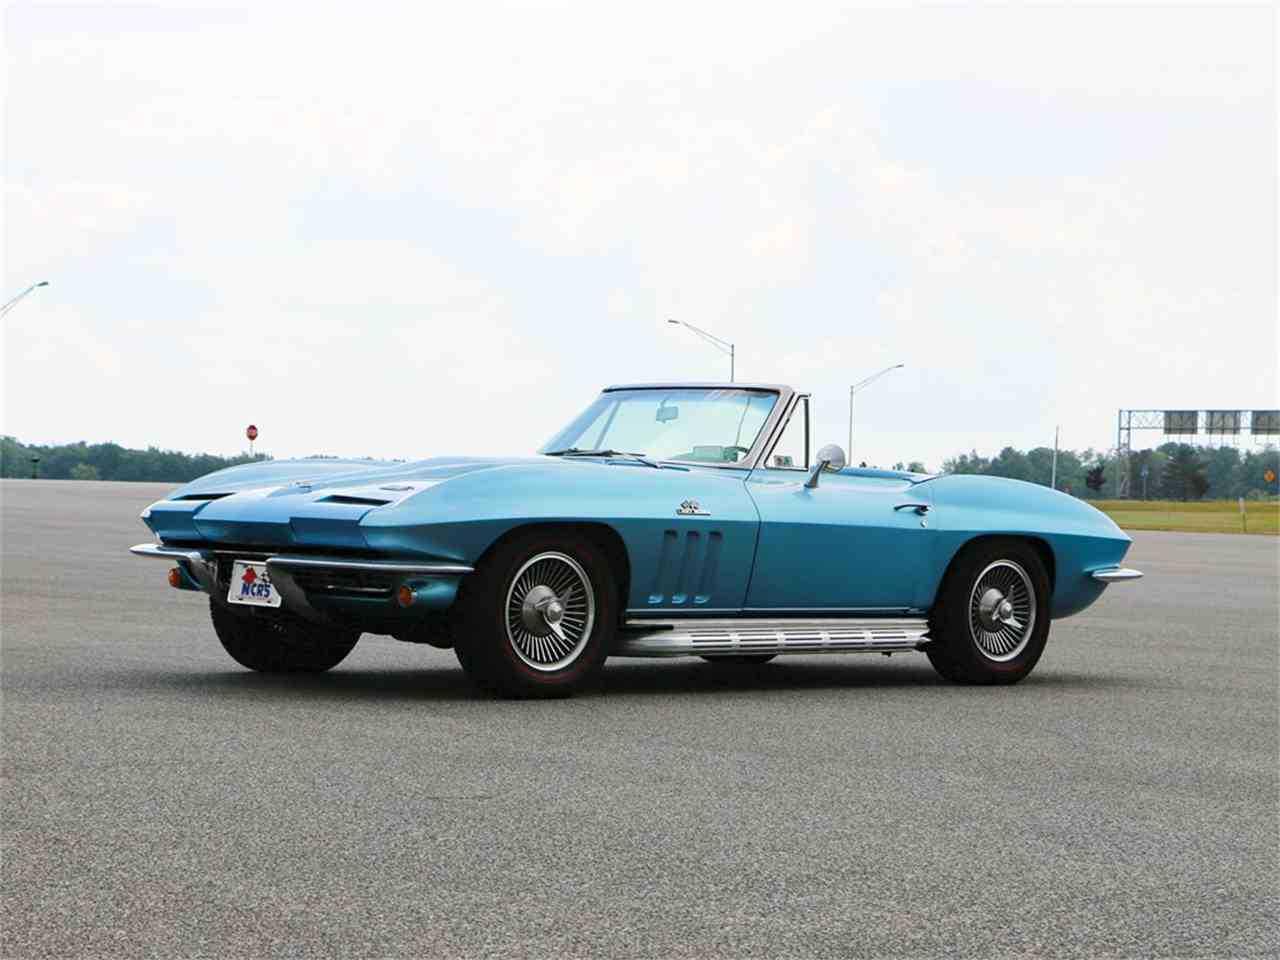 1966 Chevrolet Corvette Sting Ray Coupe For Sale In Auburn